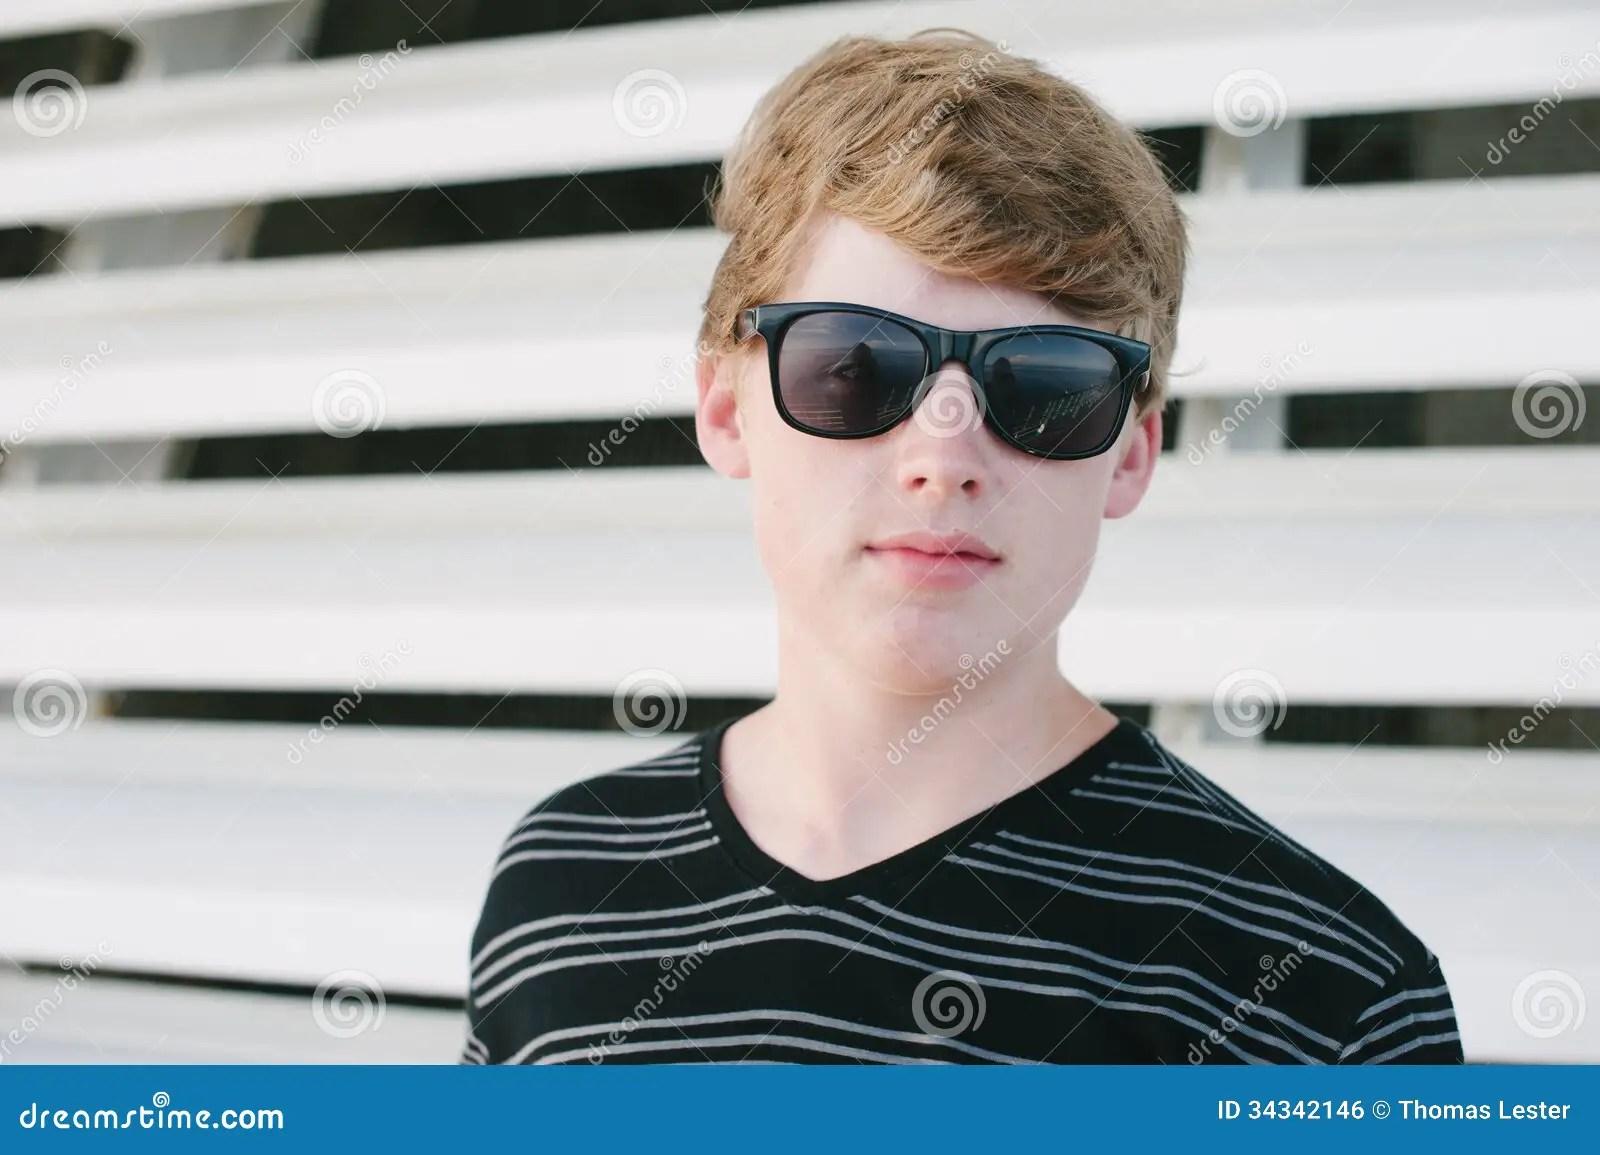 Tenn Boy In Striped Shirt And Sunglasses Royalty Free